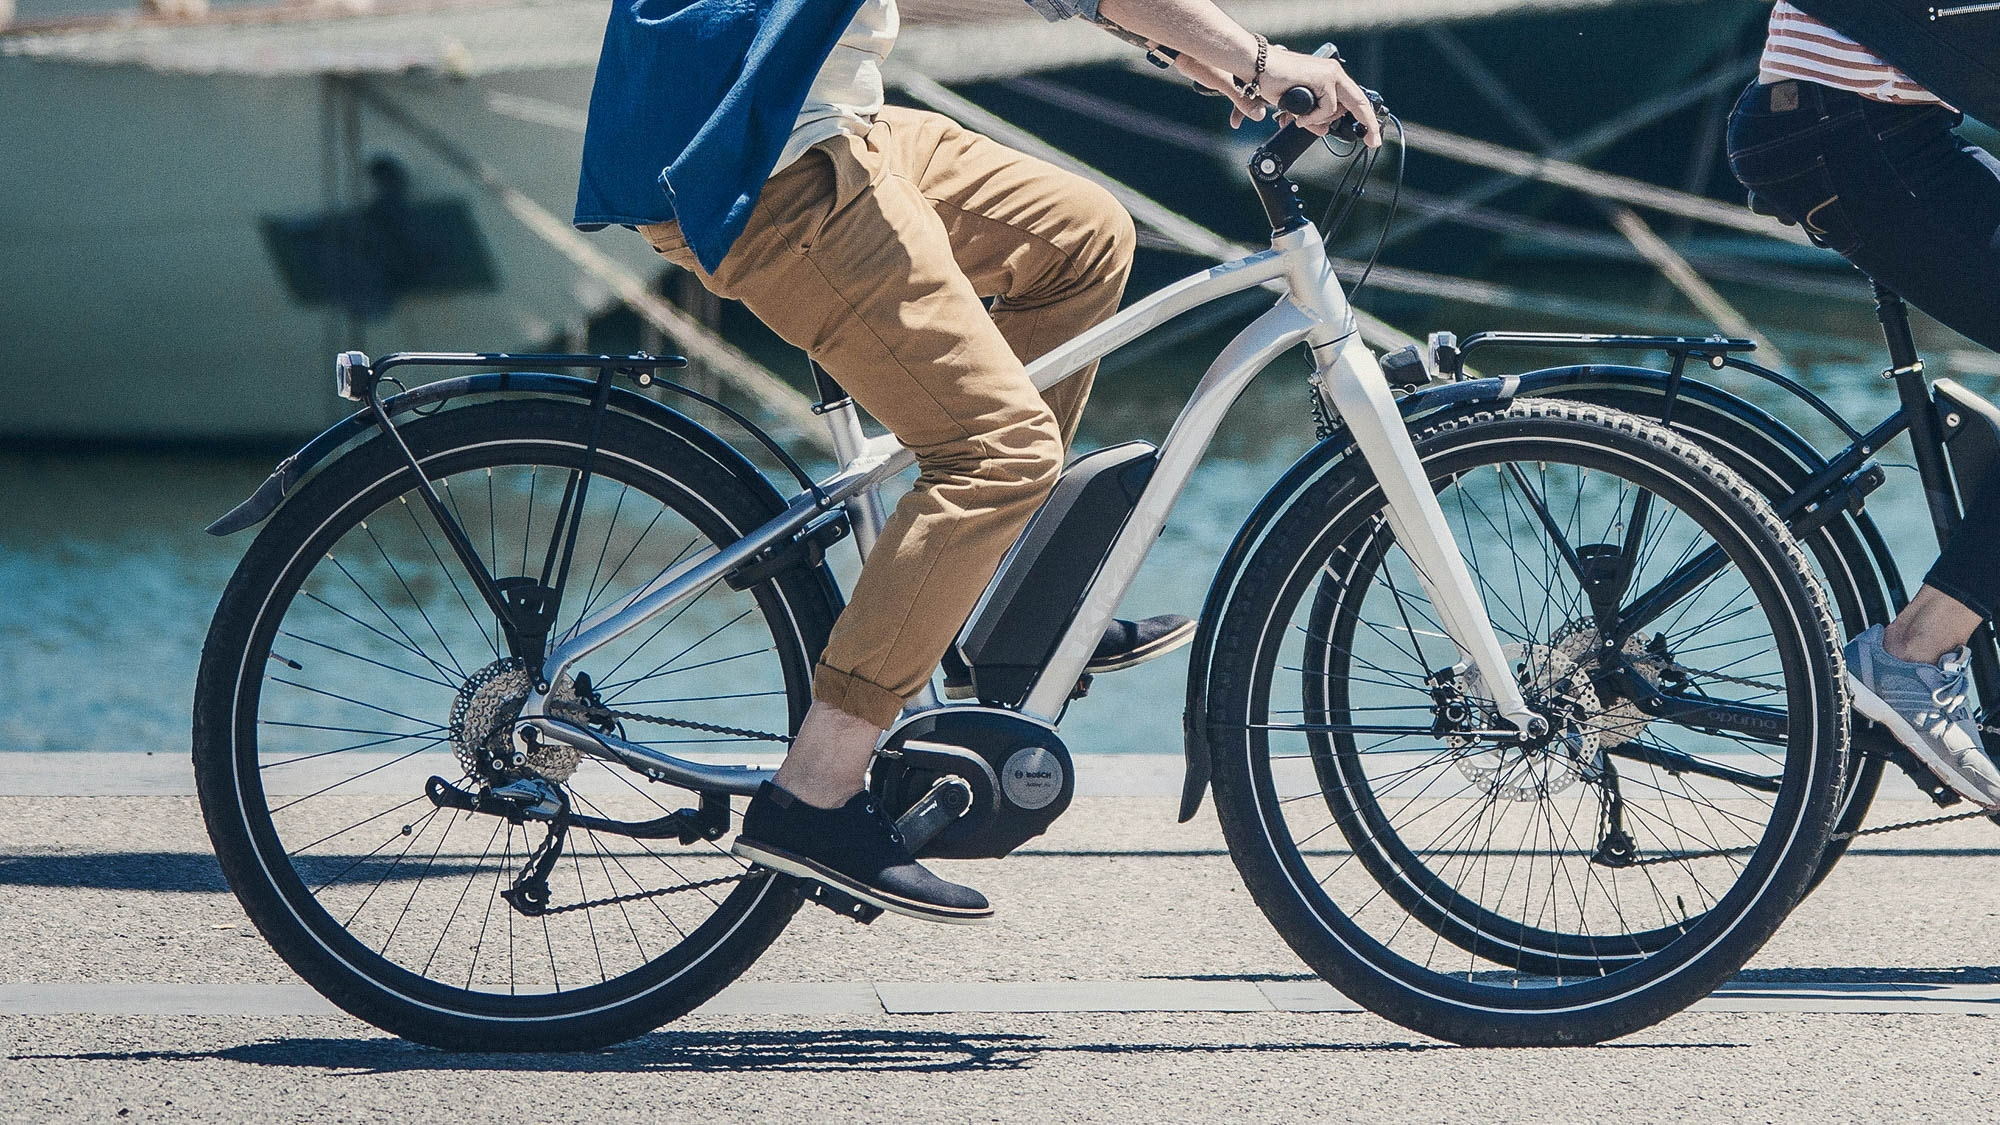 bike polish spray online dating